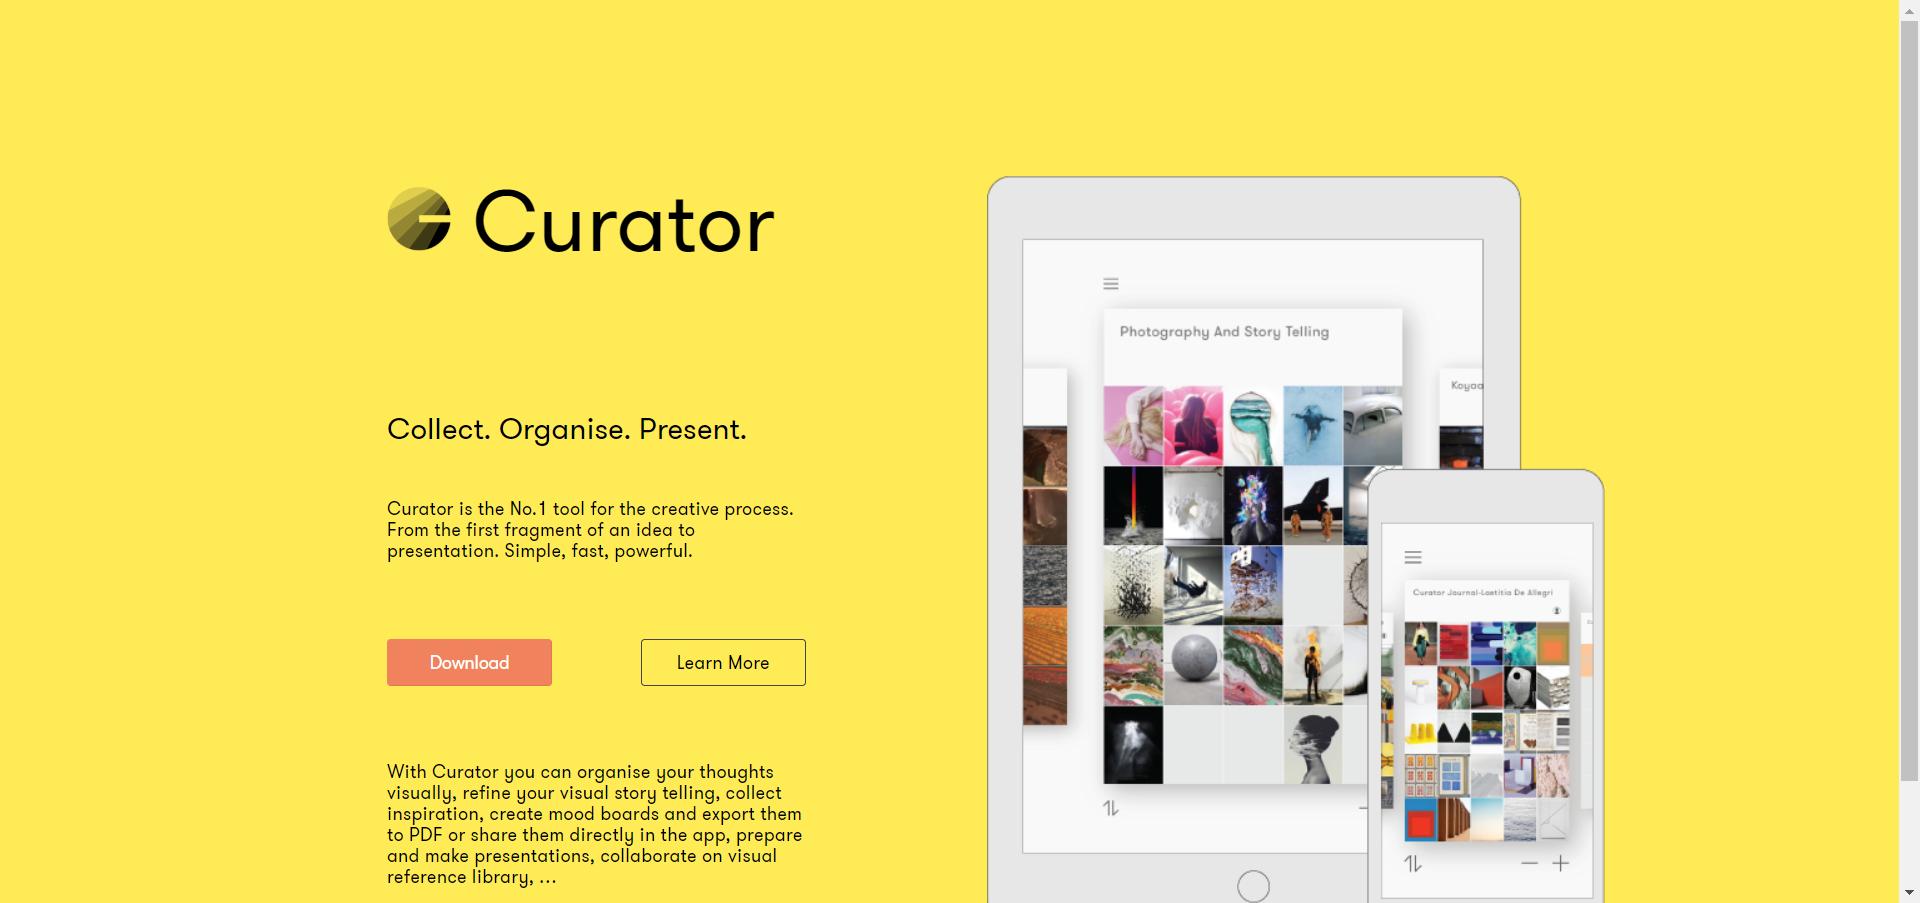 Curator website image